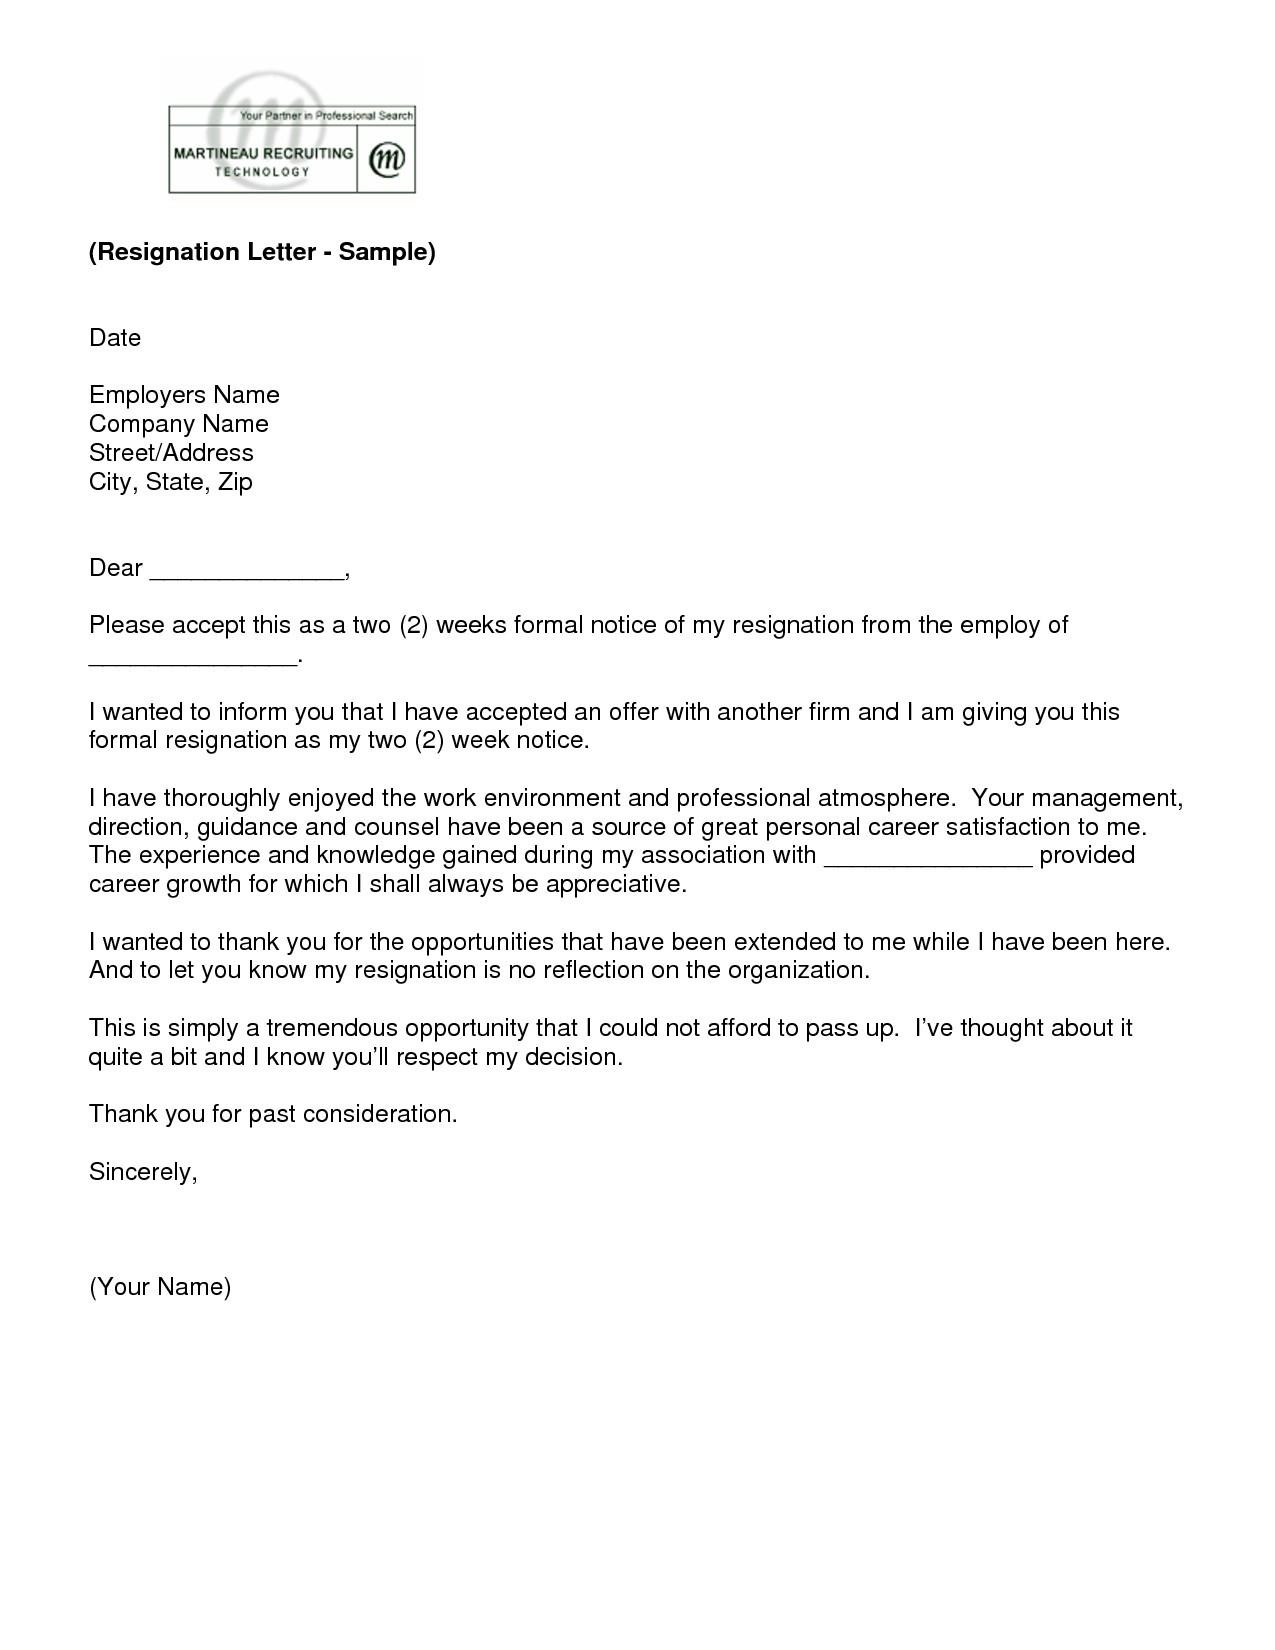 Short Resignation Letter Template - Job Notice Letter Sample Refrence Resignation Letter Sample with